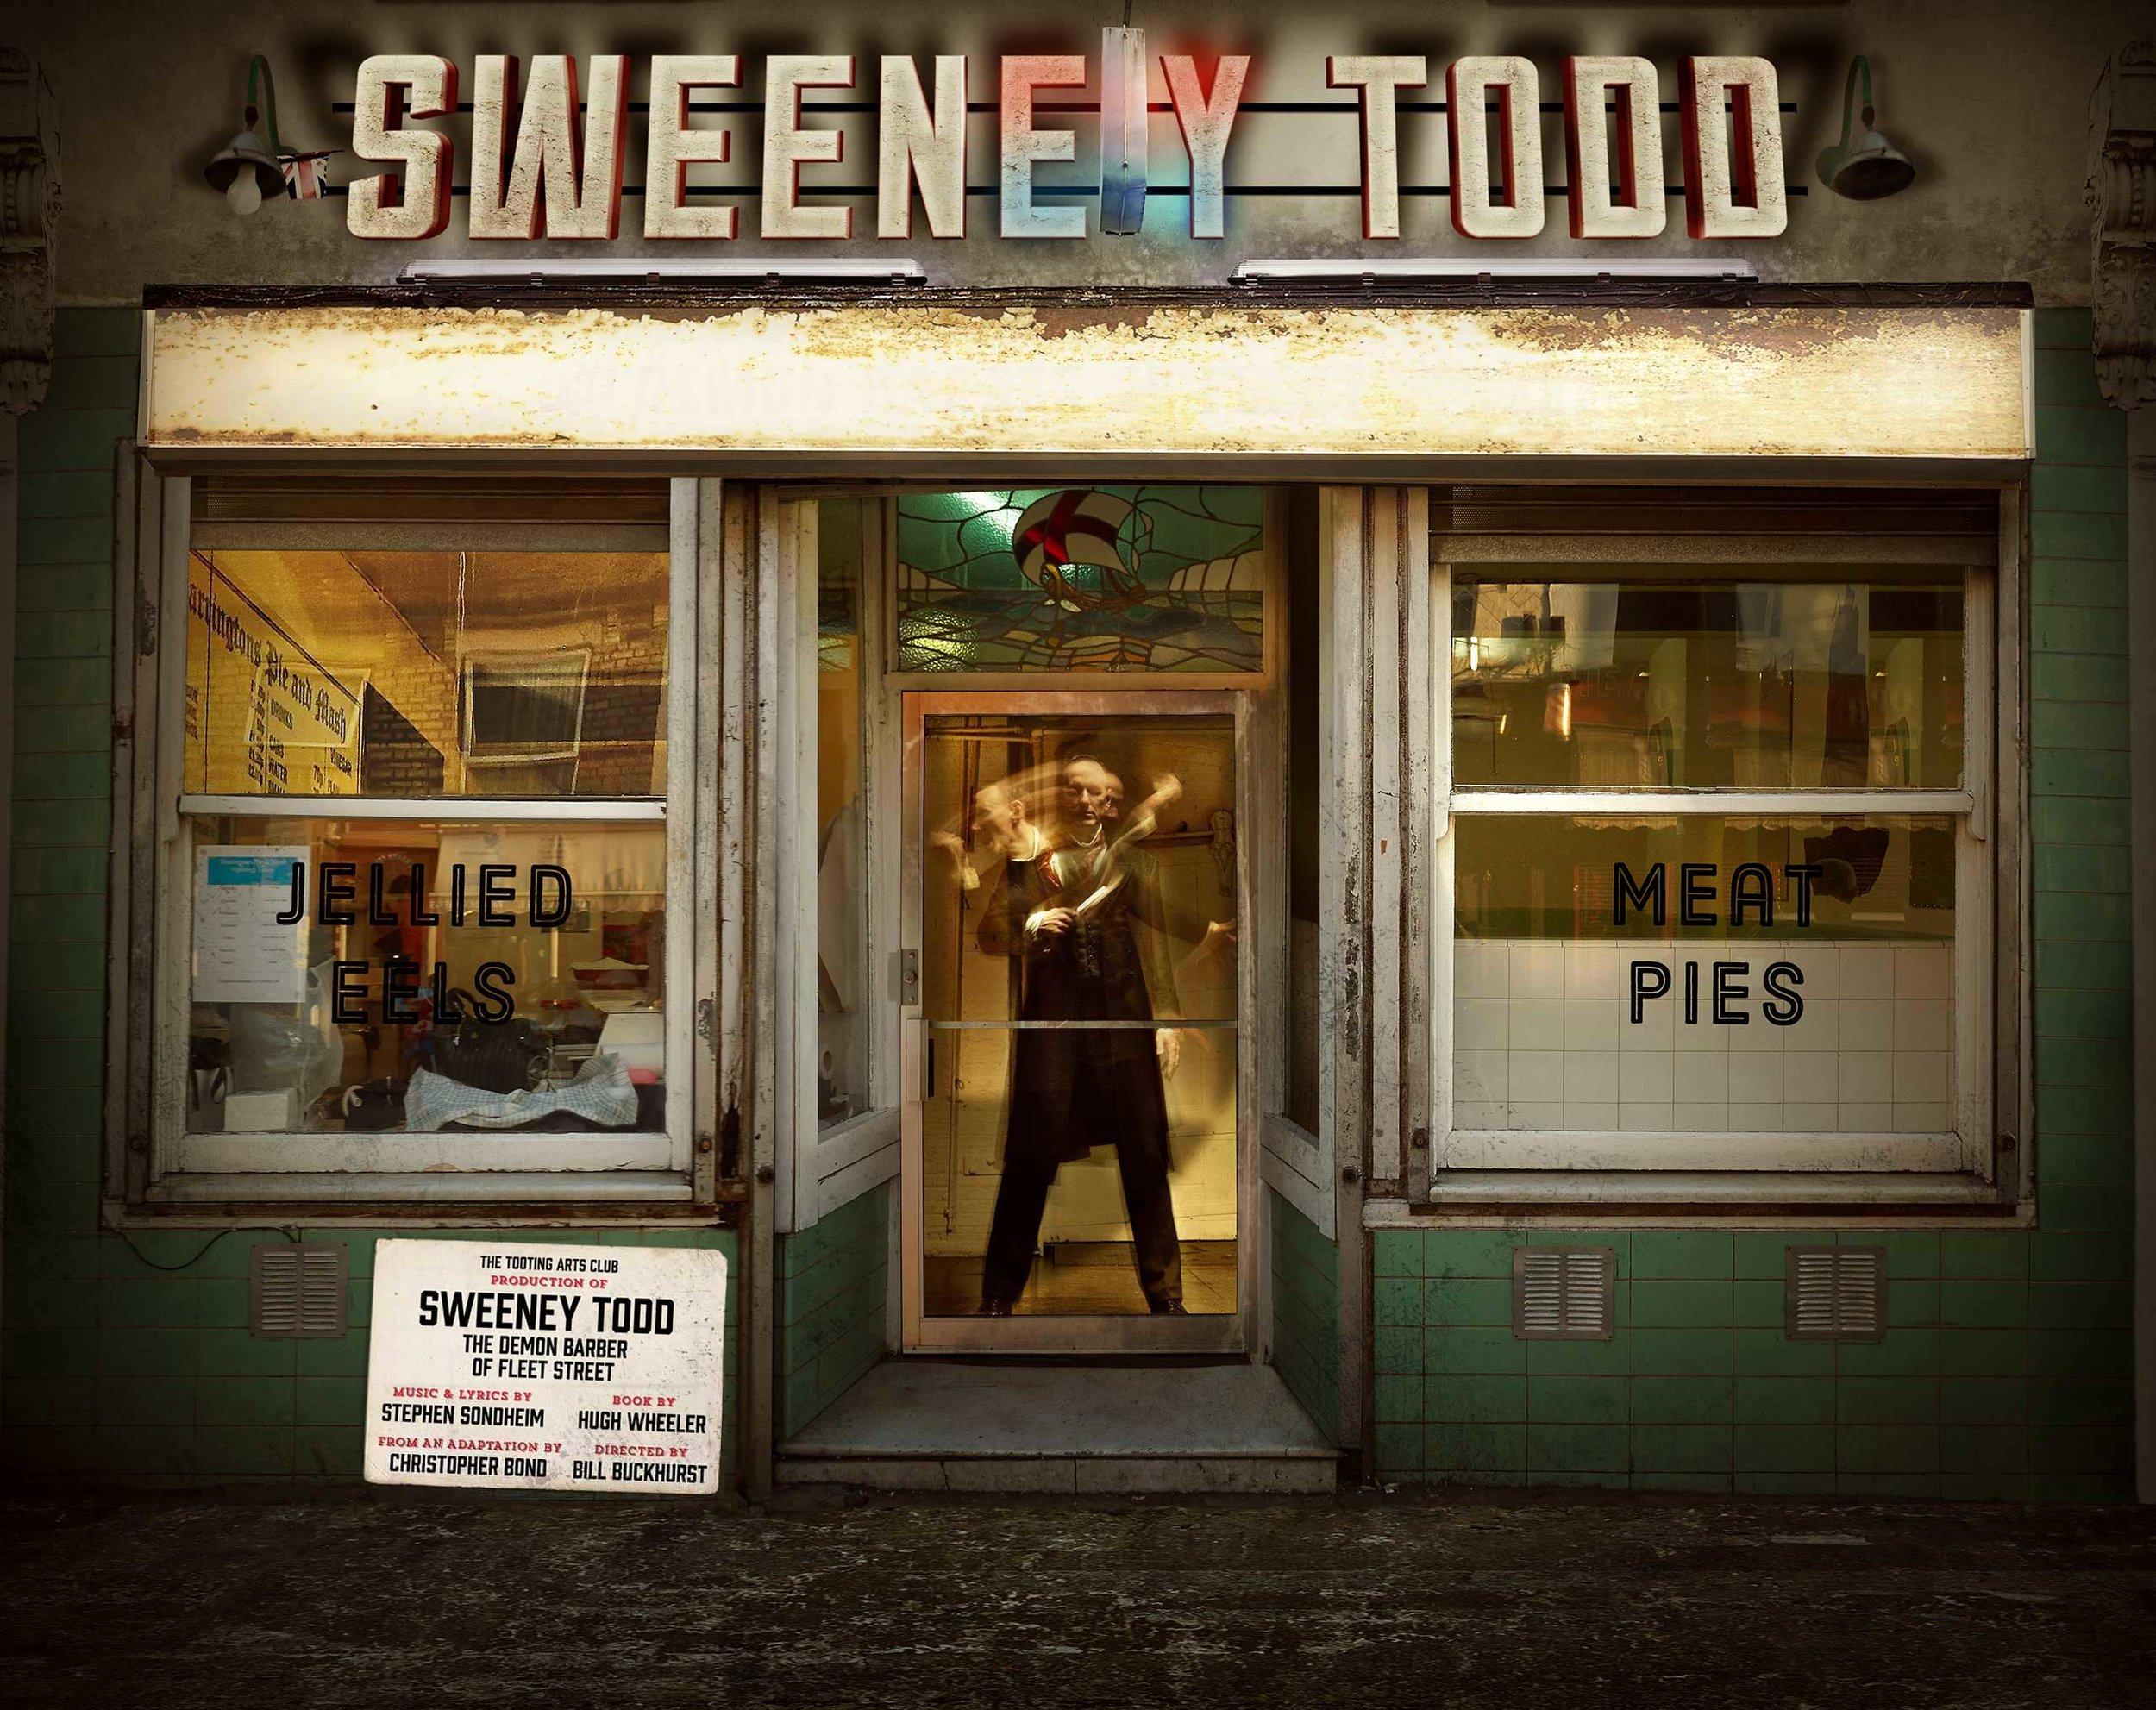 Sweeney Todd at Barrow Street Theatre